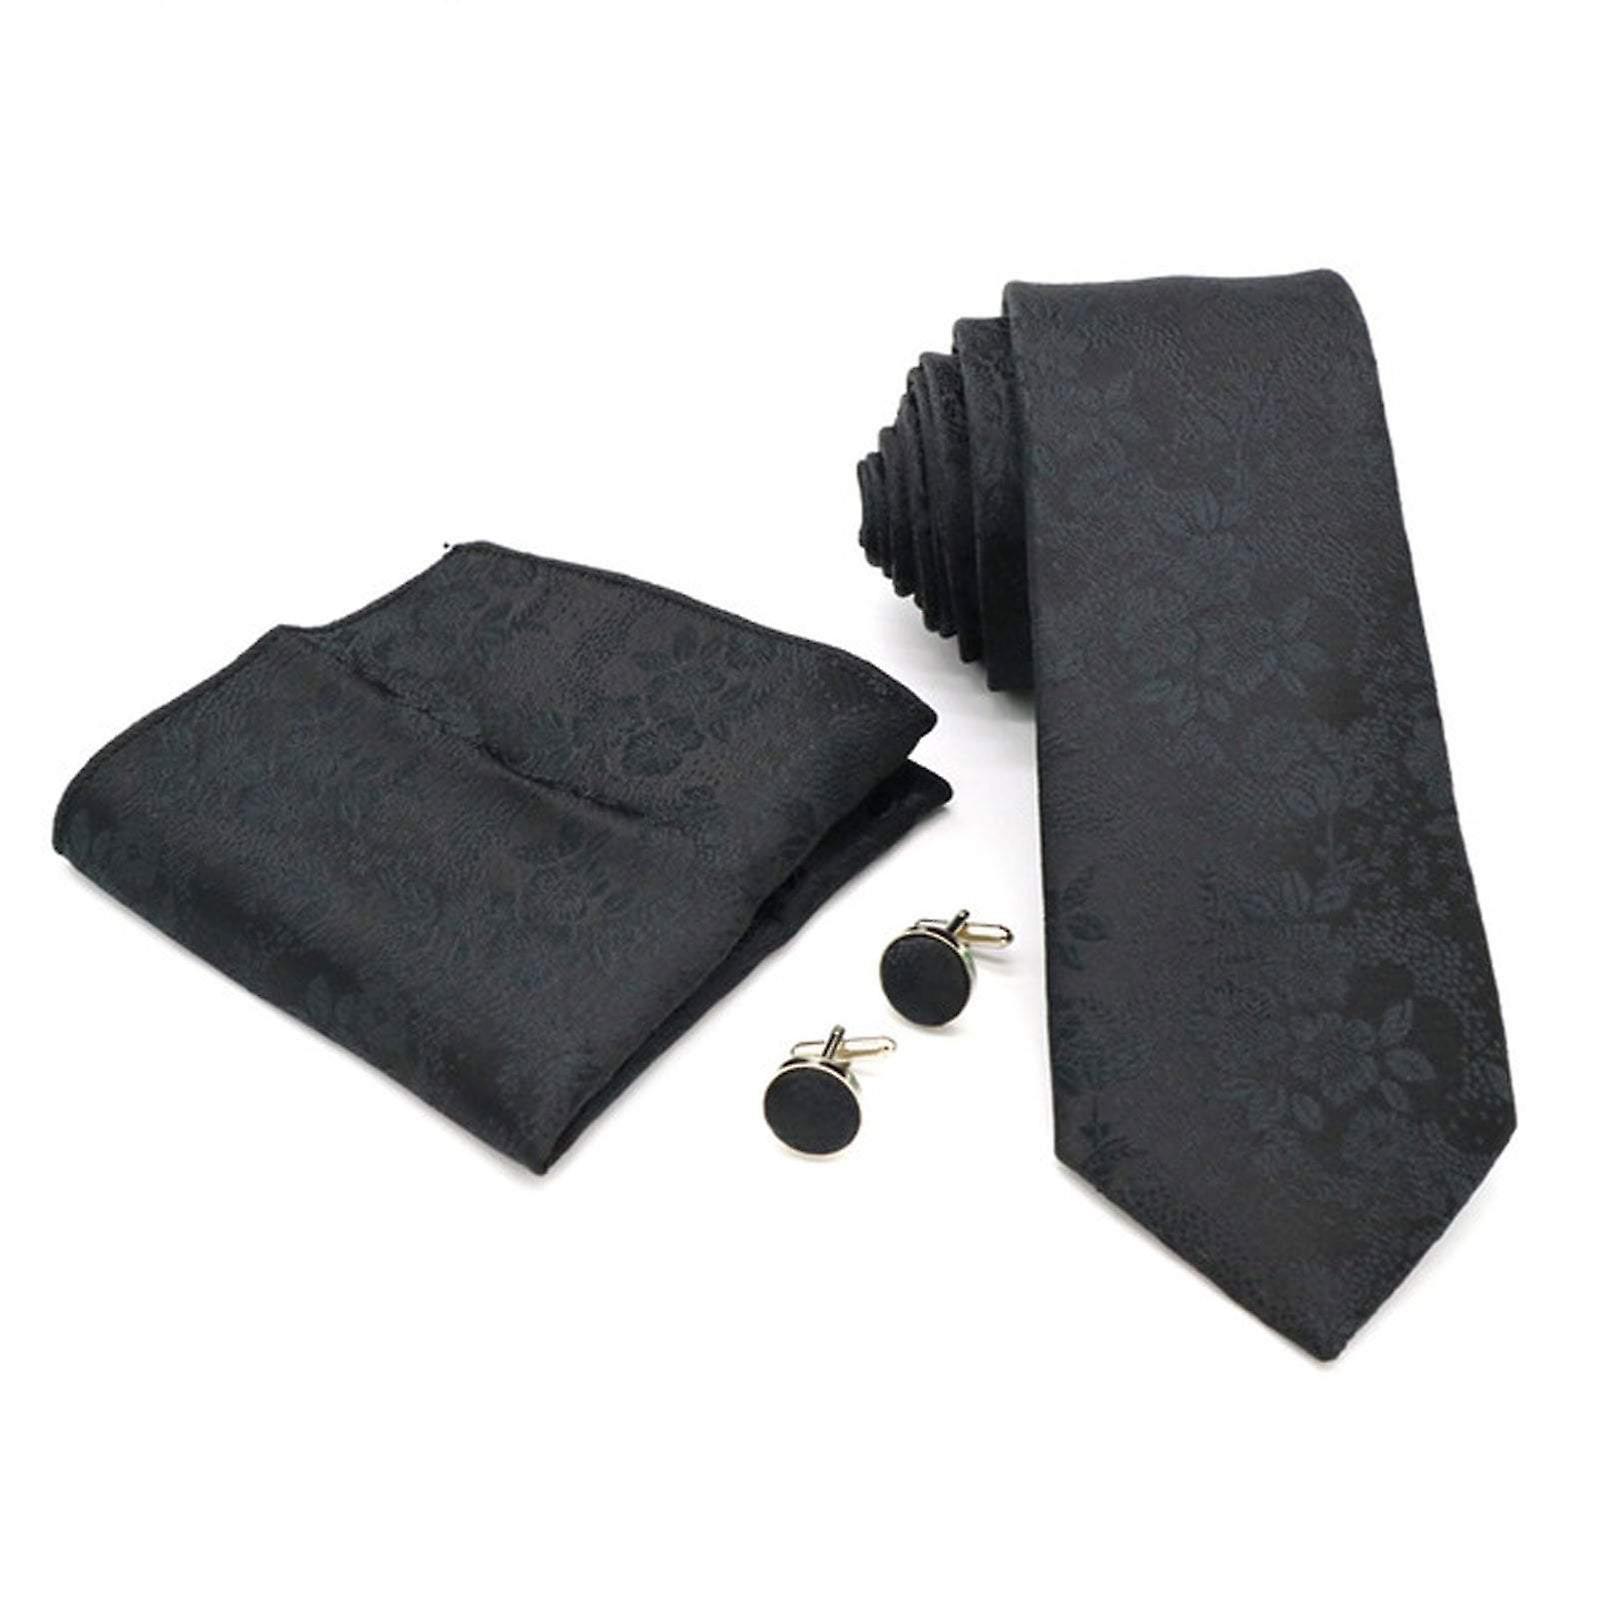 Black floral three piece tie cuff link & pocket square